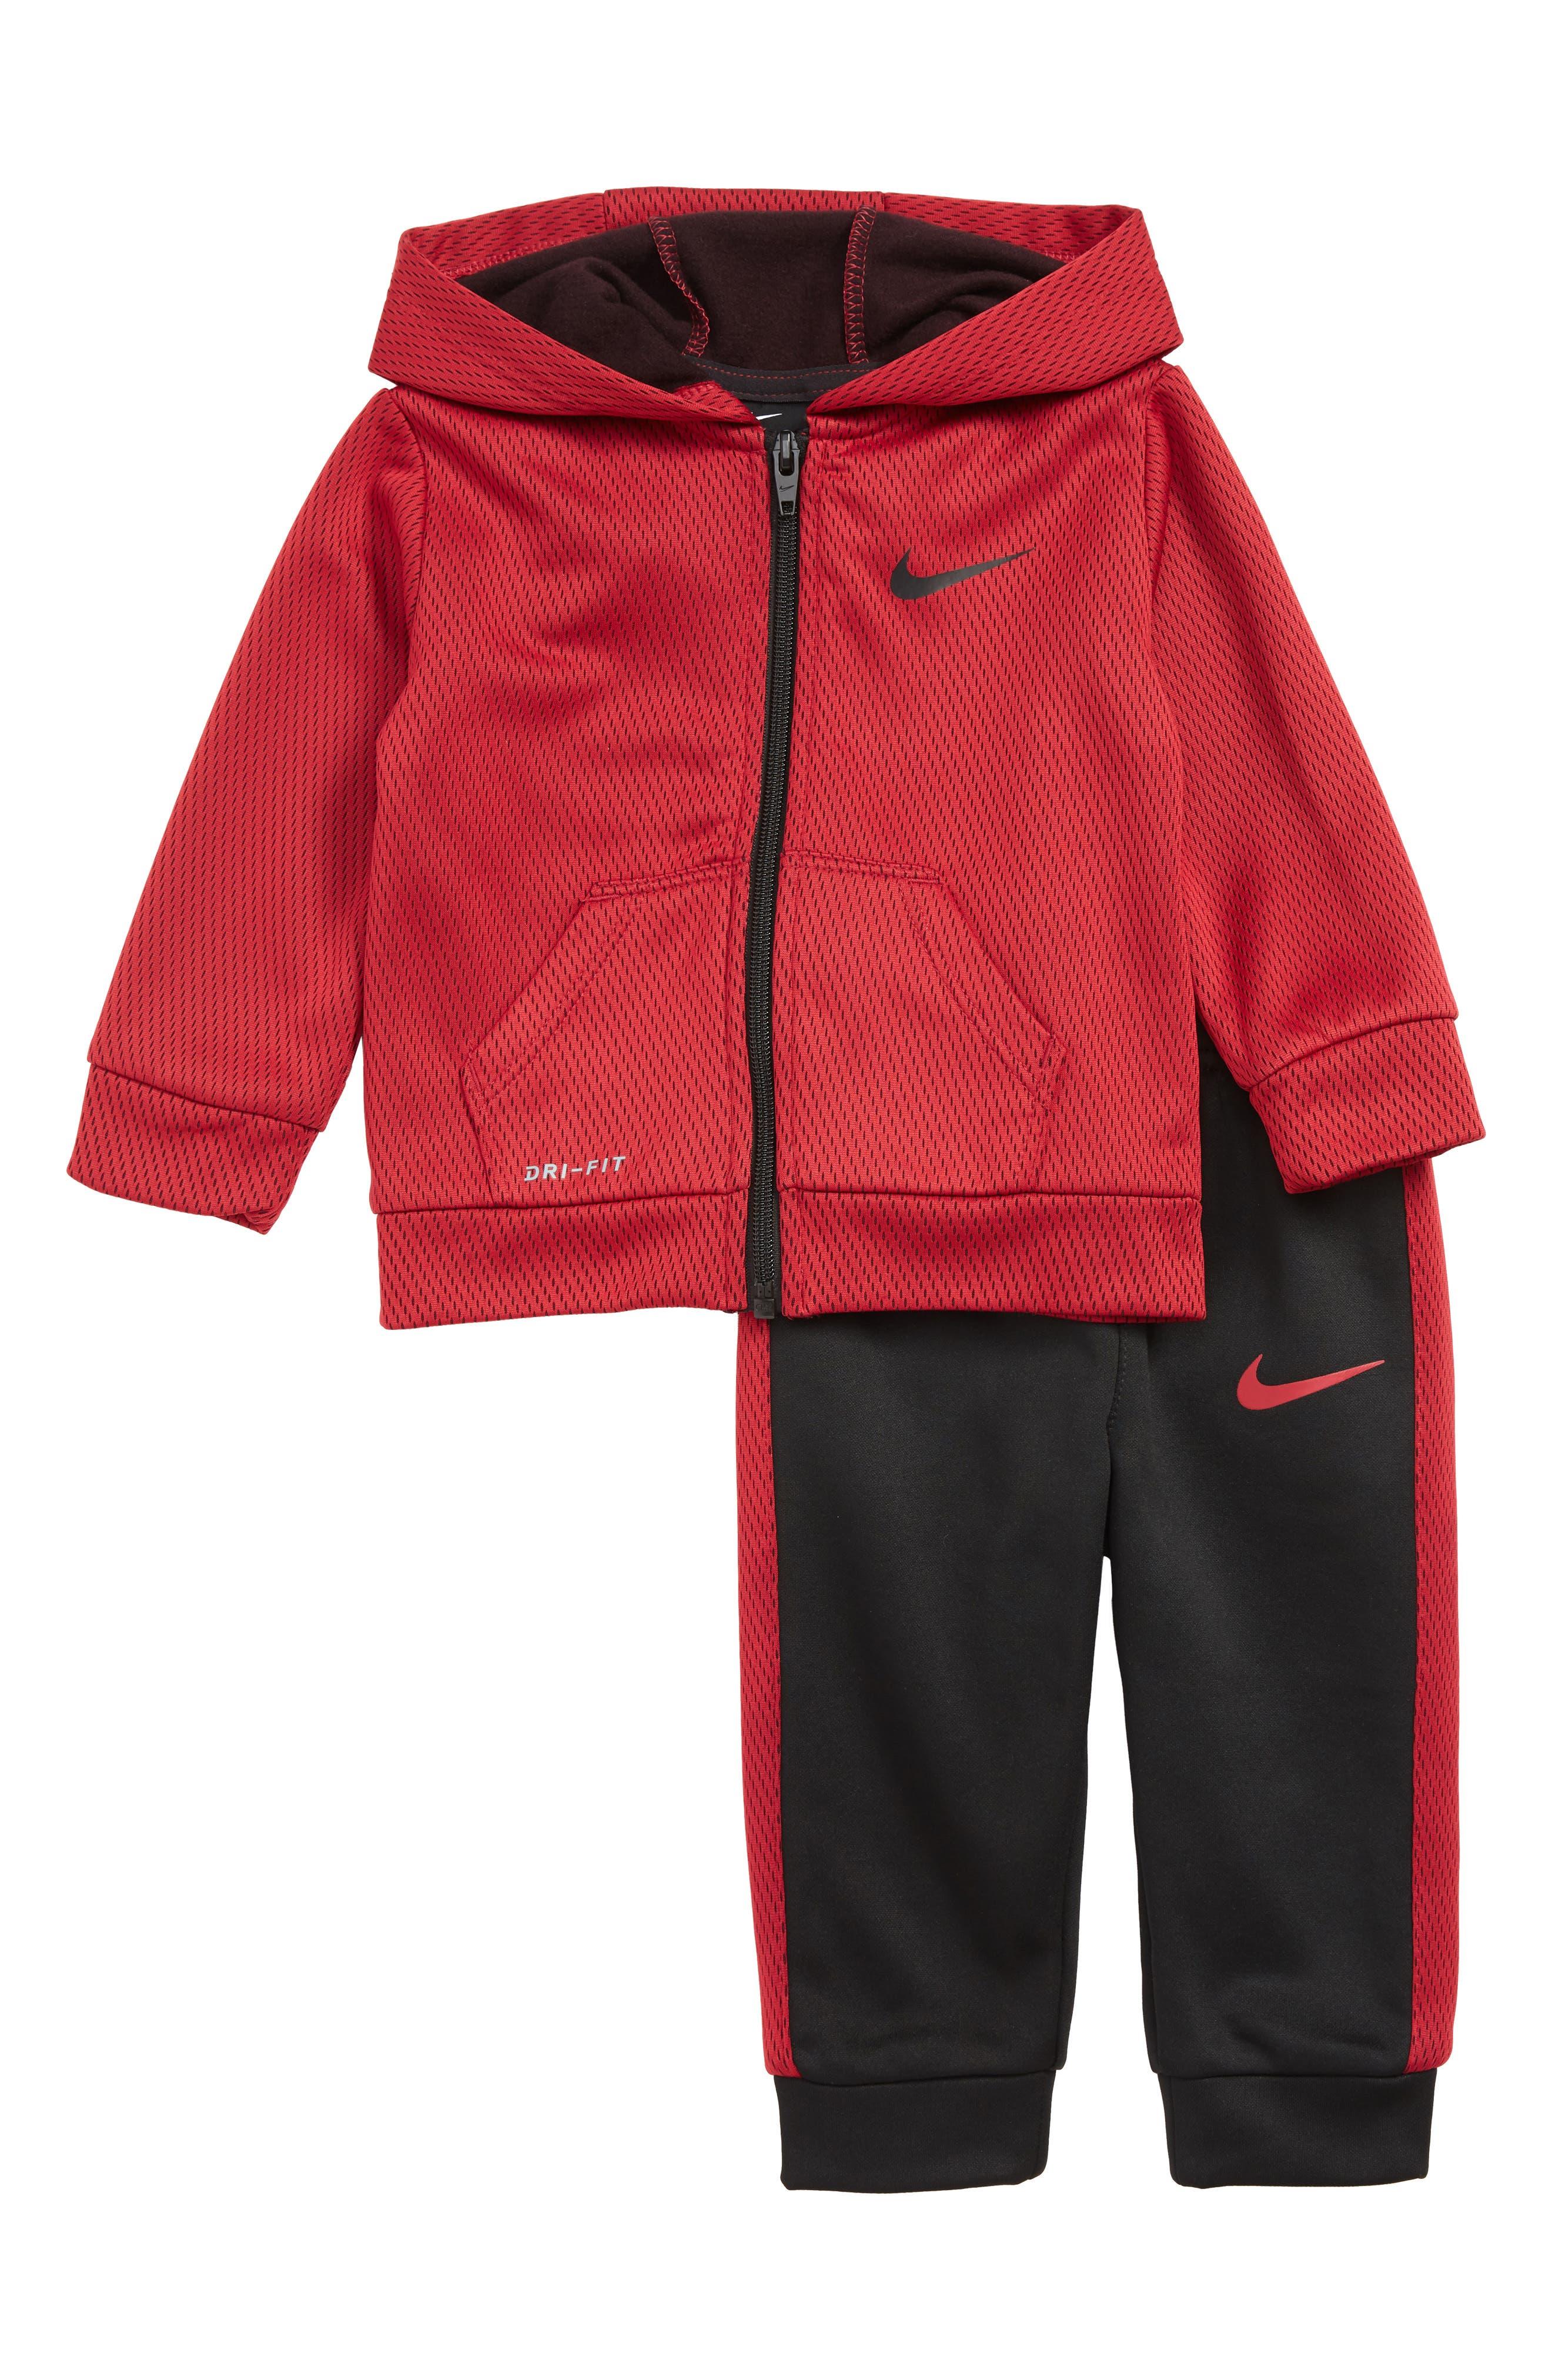 Infant Boys Nike Dry Mesh Face Therma FullZip Hoodie  Sweatpants Set